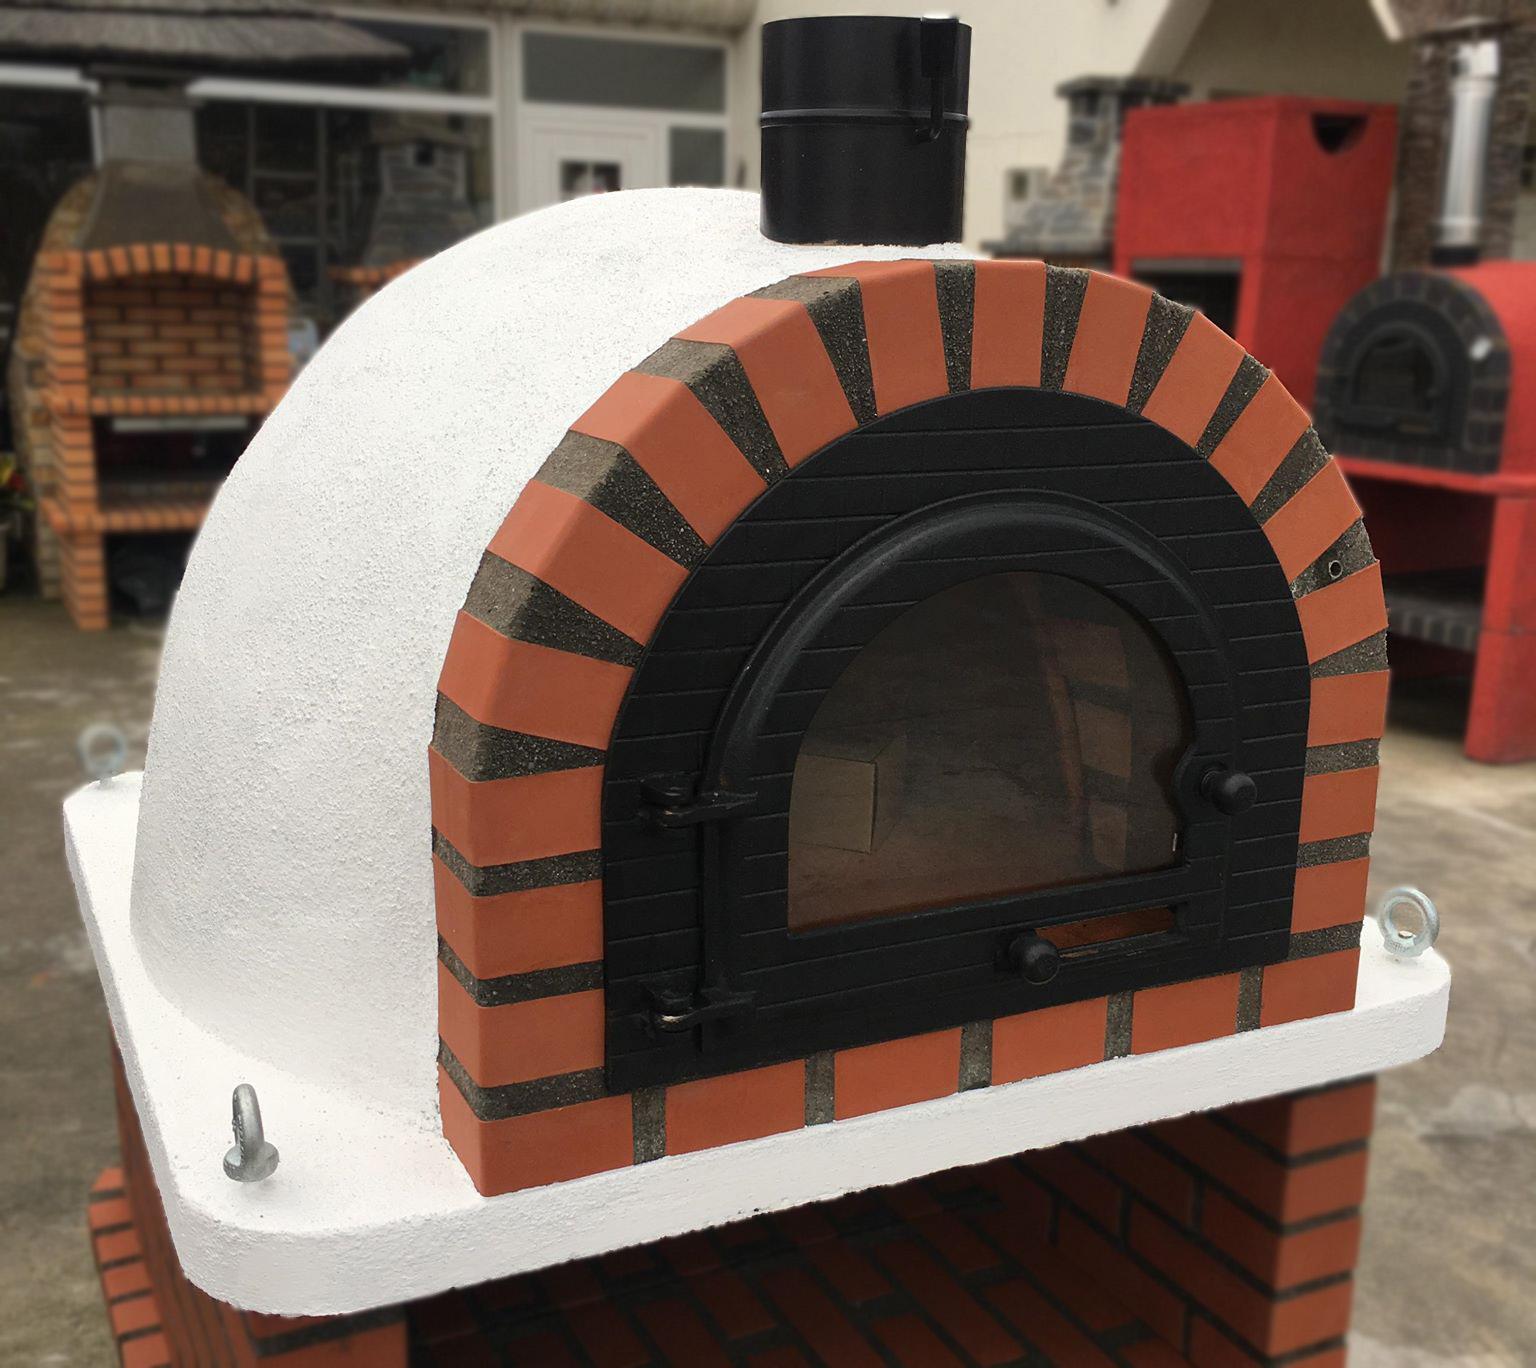 Pizzaugn | Vedugn | Stenugn Forno Traditional Standard med glaslucka